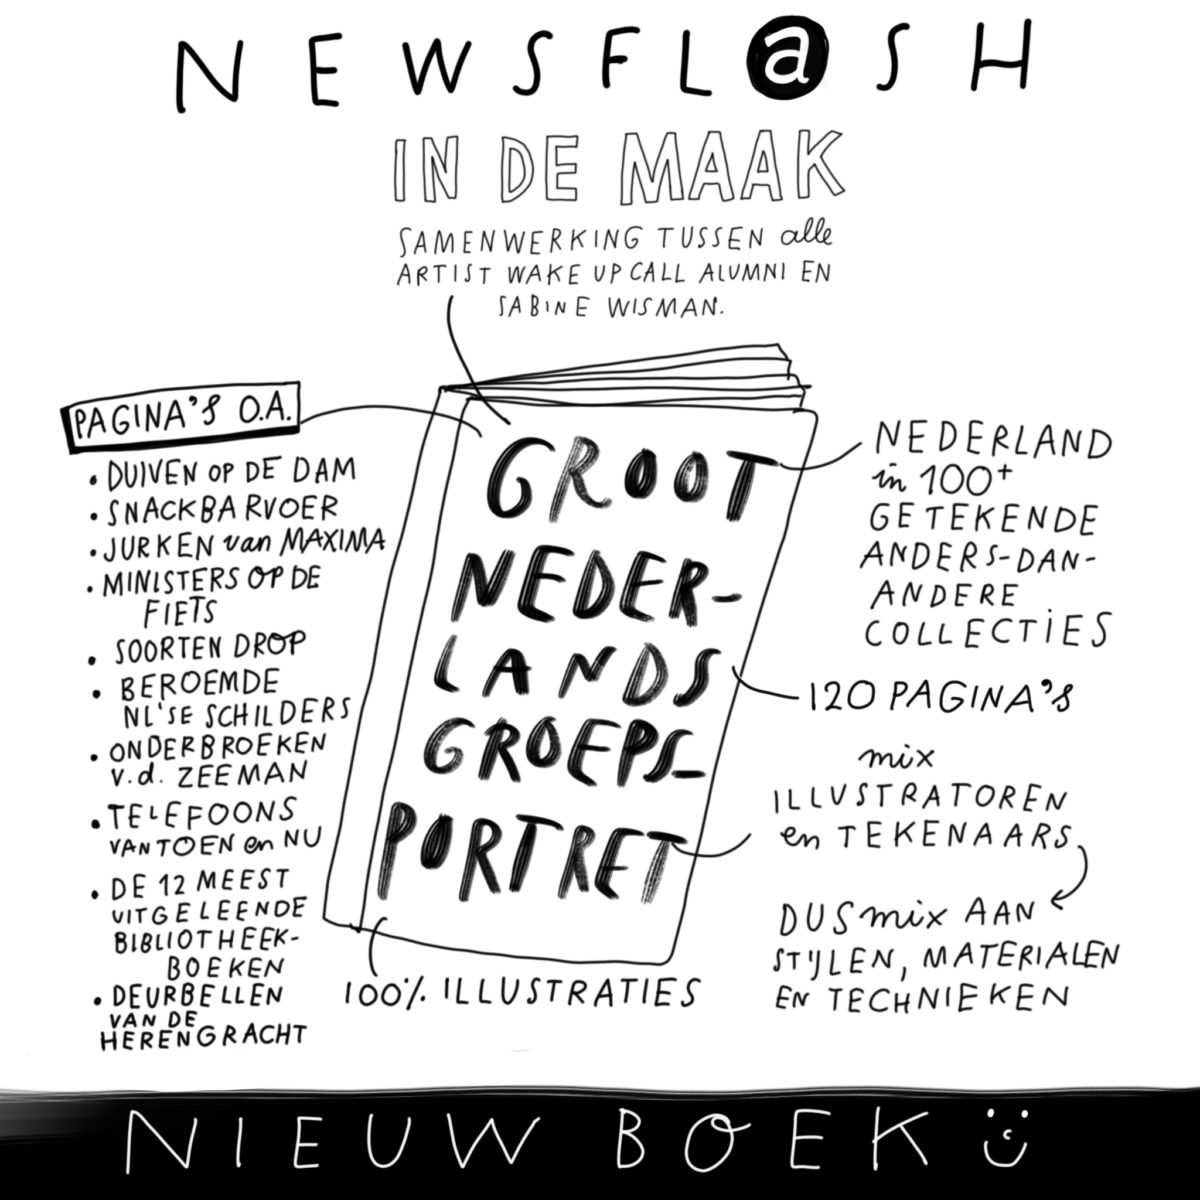 Groot Nederlands Groepsportret